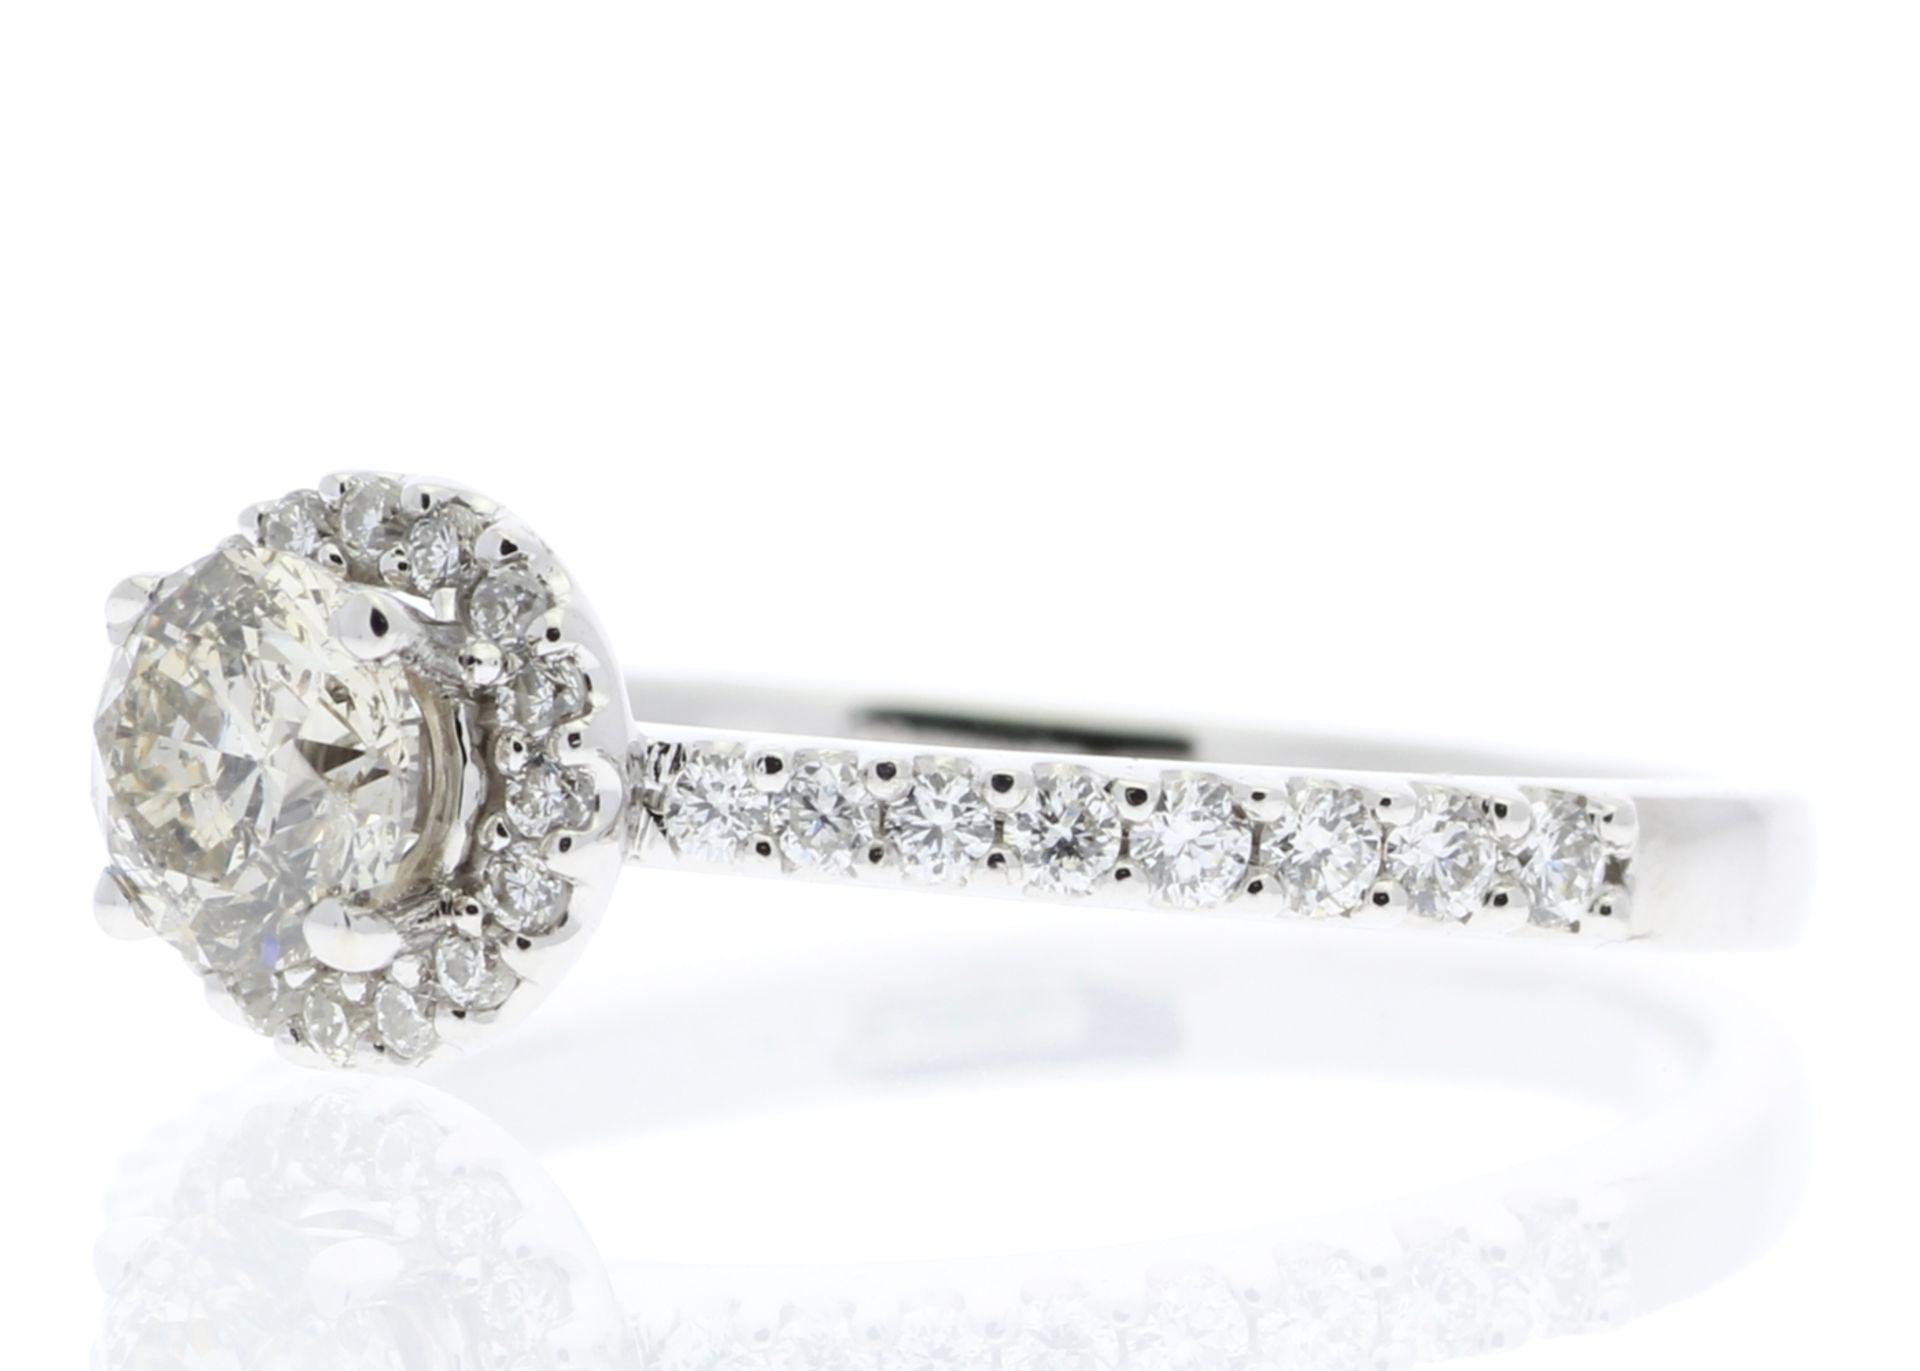 18ct White Gold Single Stone Halo Set With Stone Set Shoulders Diamond Ring (0.25) 0.52 Carats - - Image 2 of 4